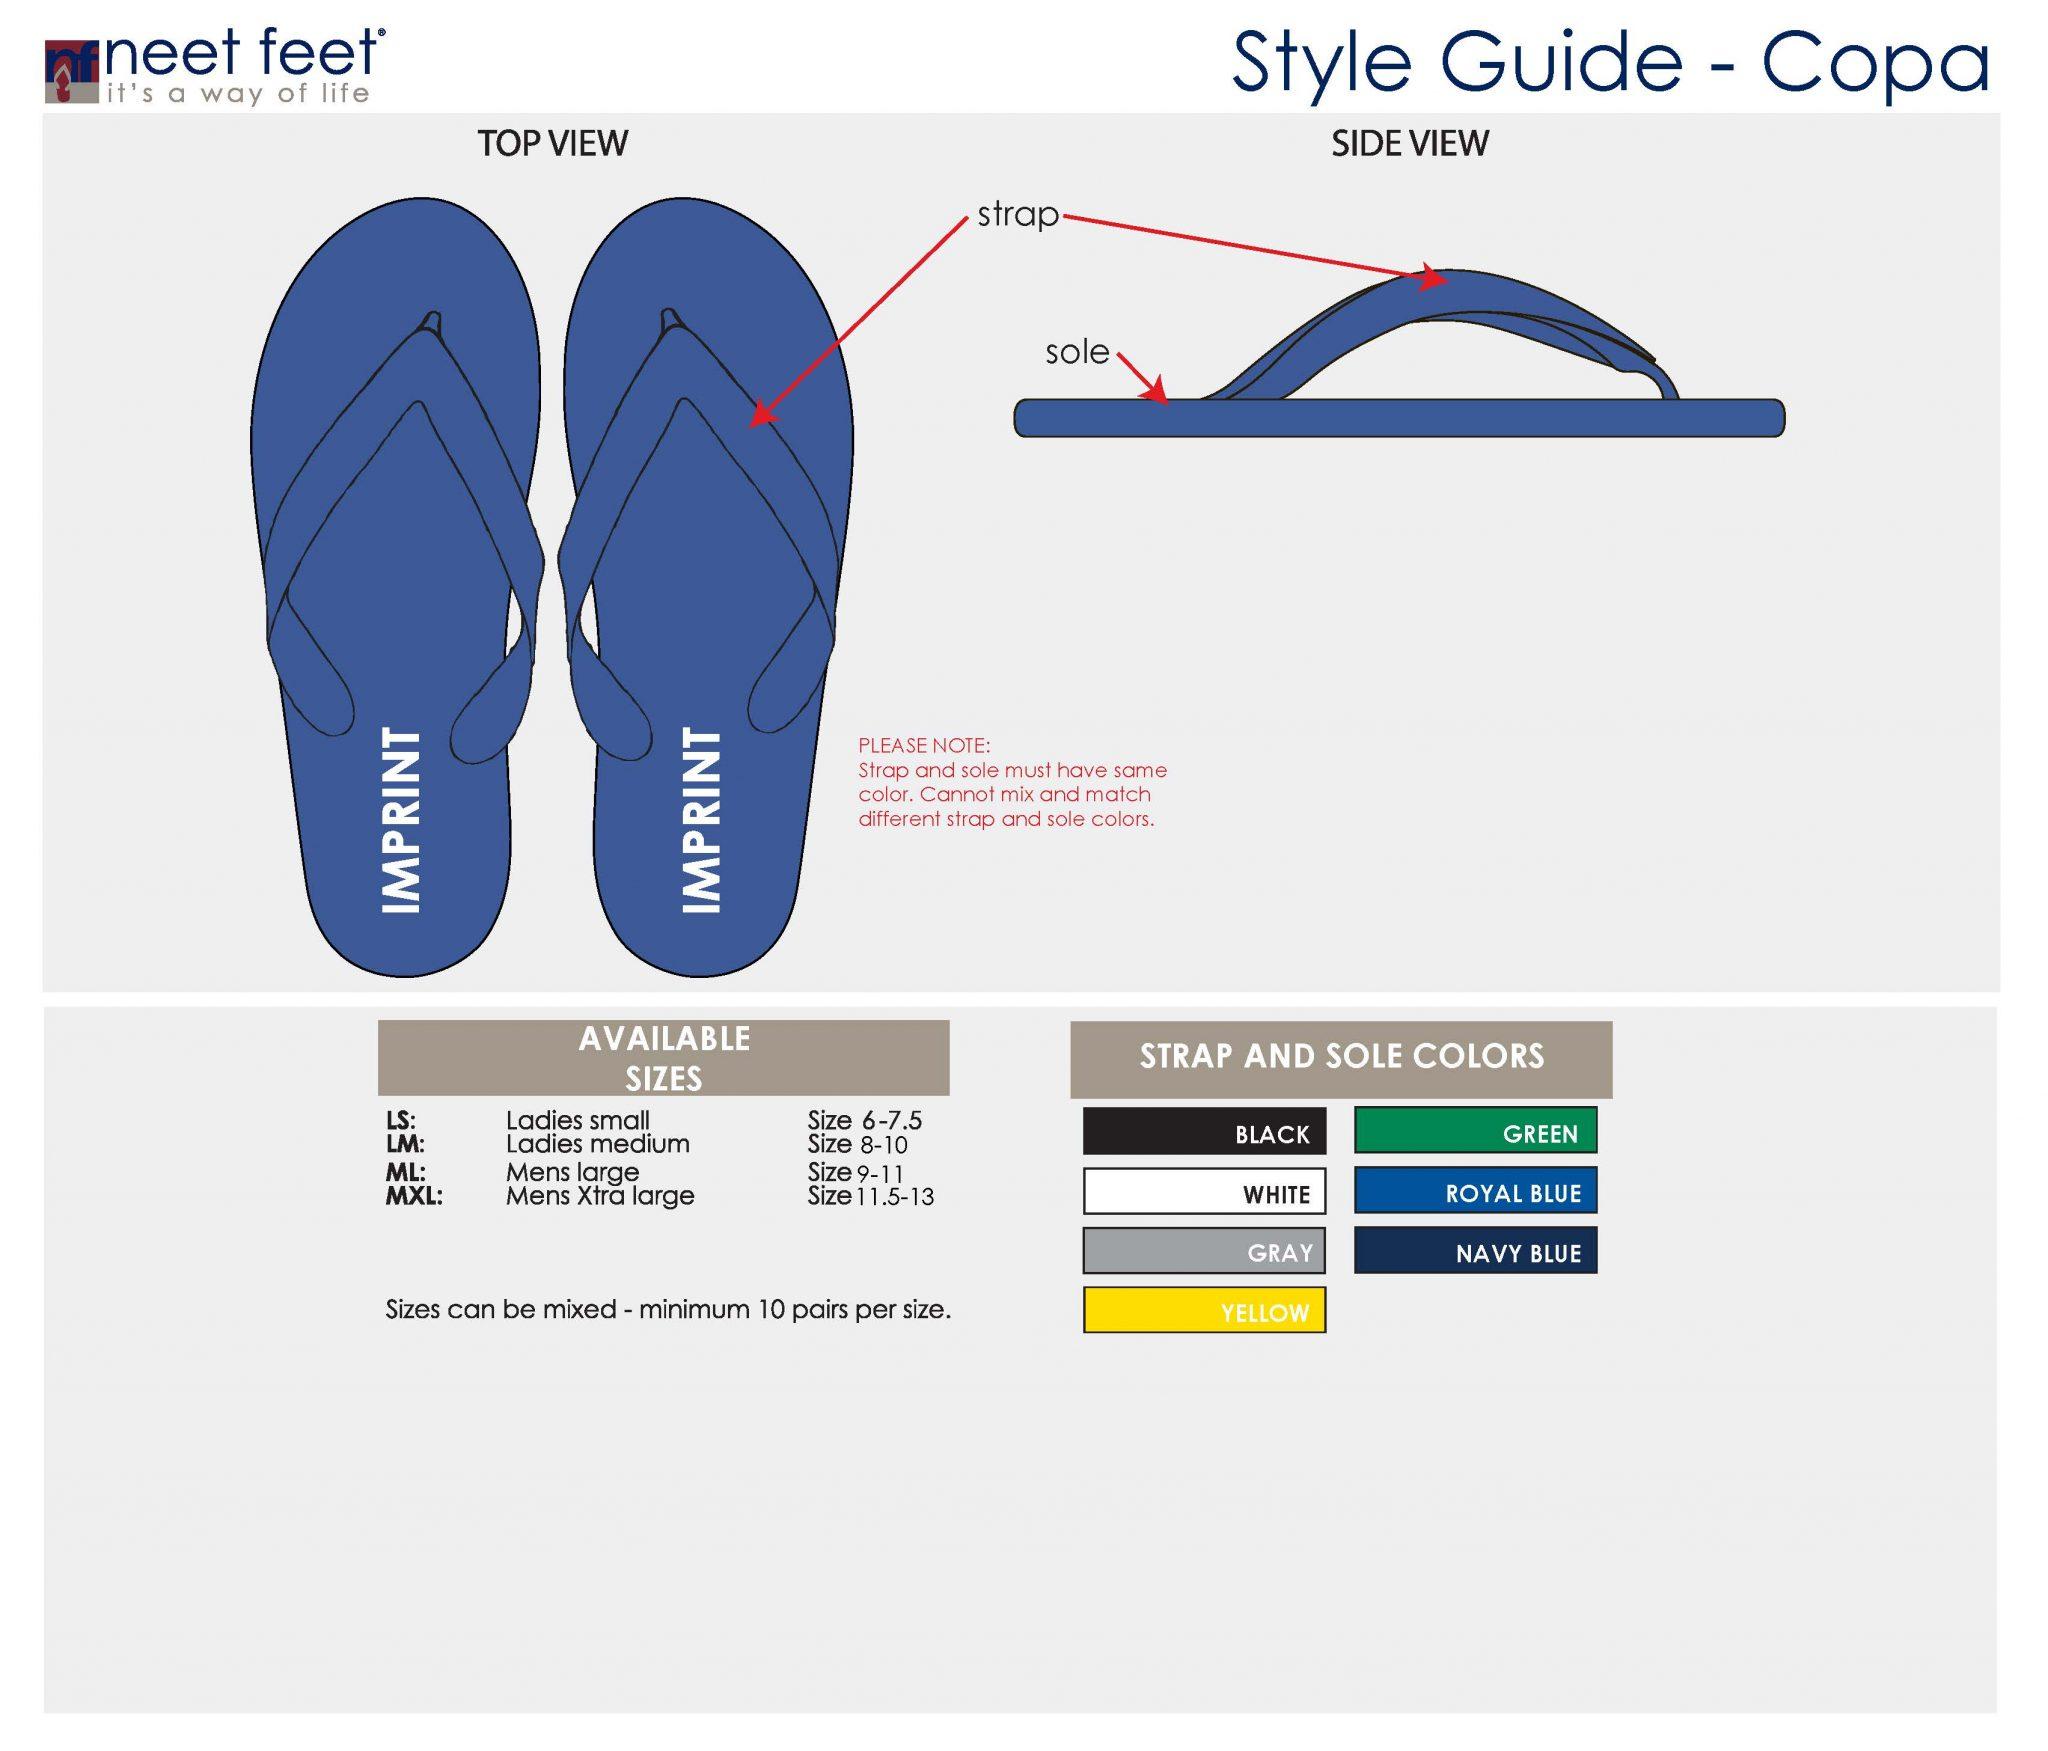 Copa Style Guide